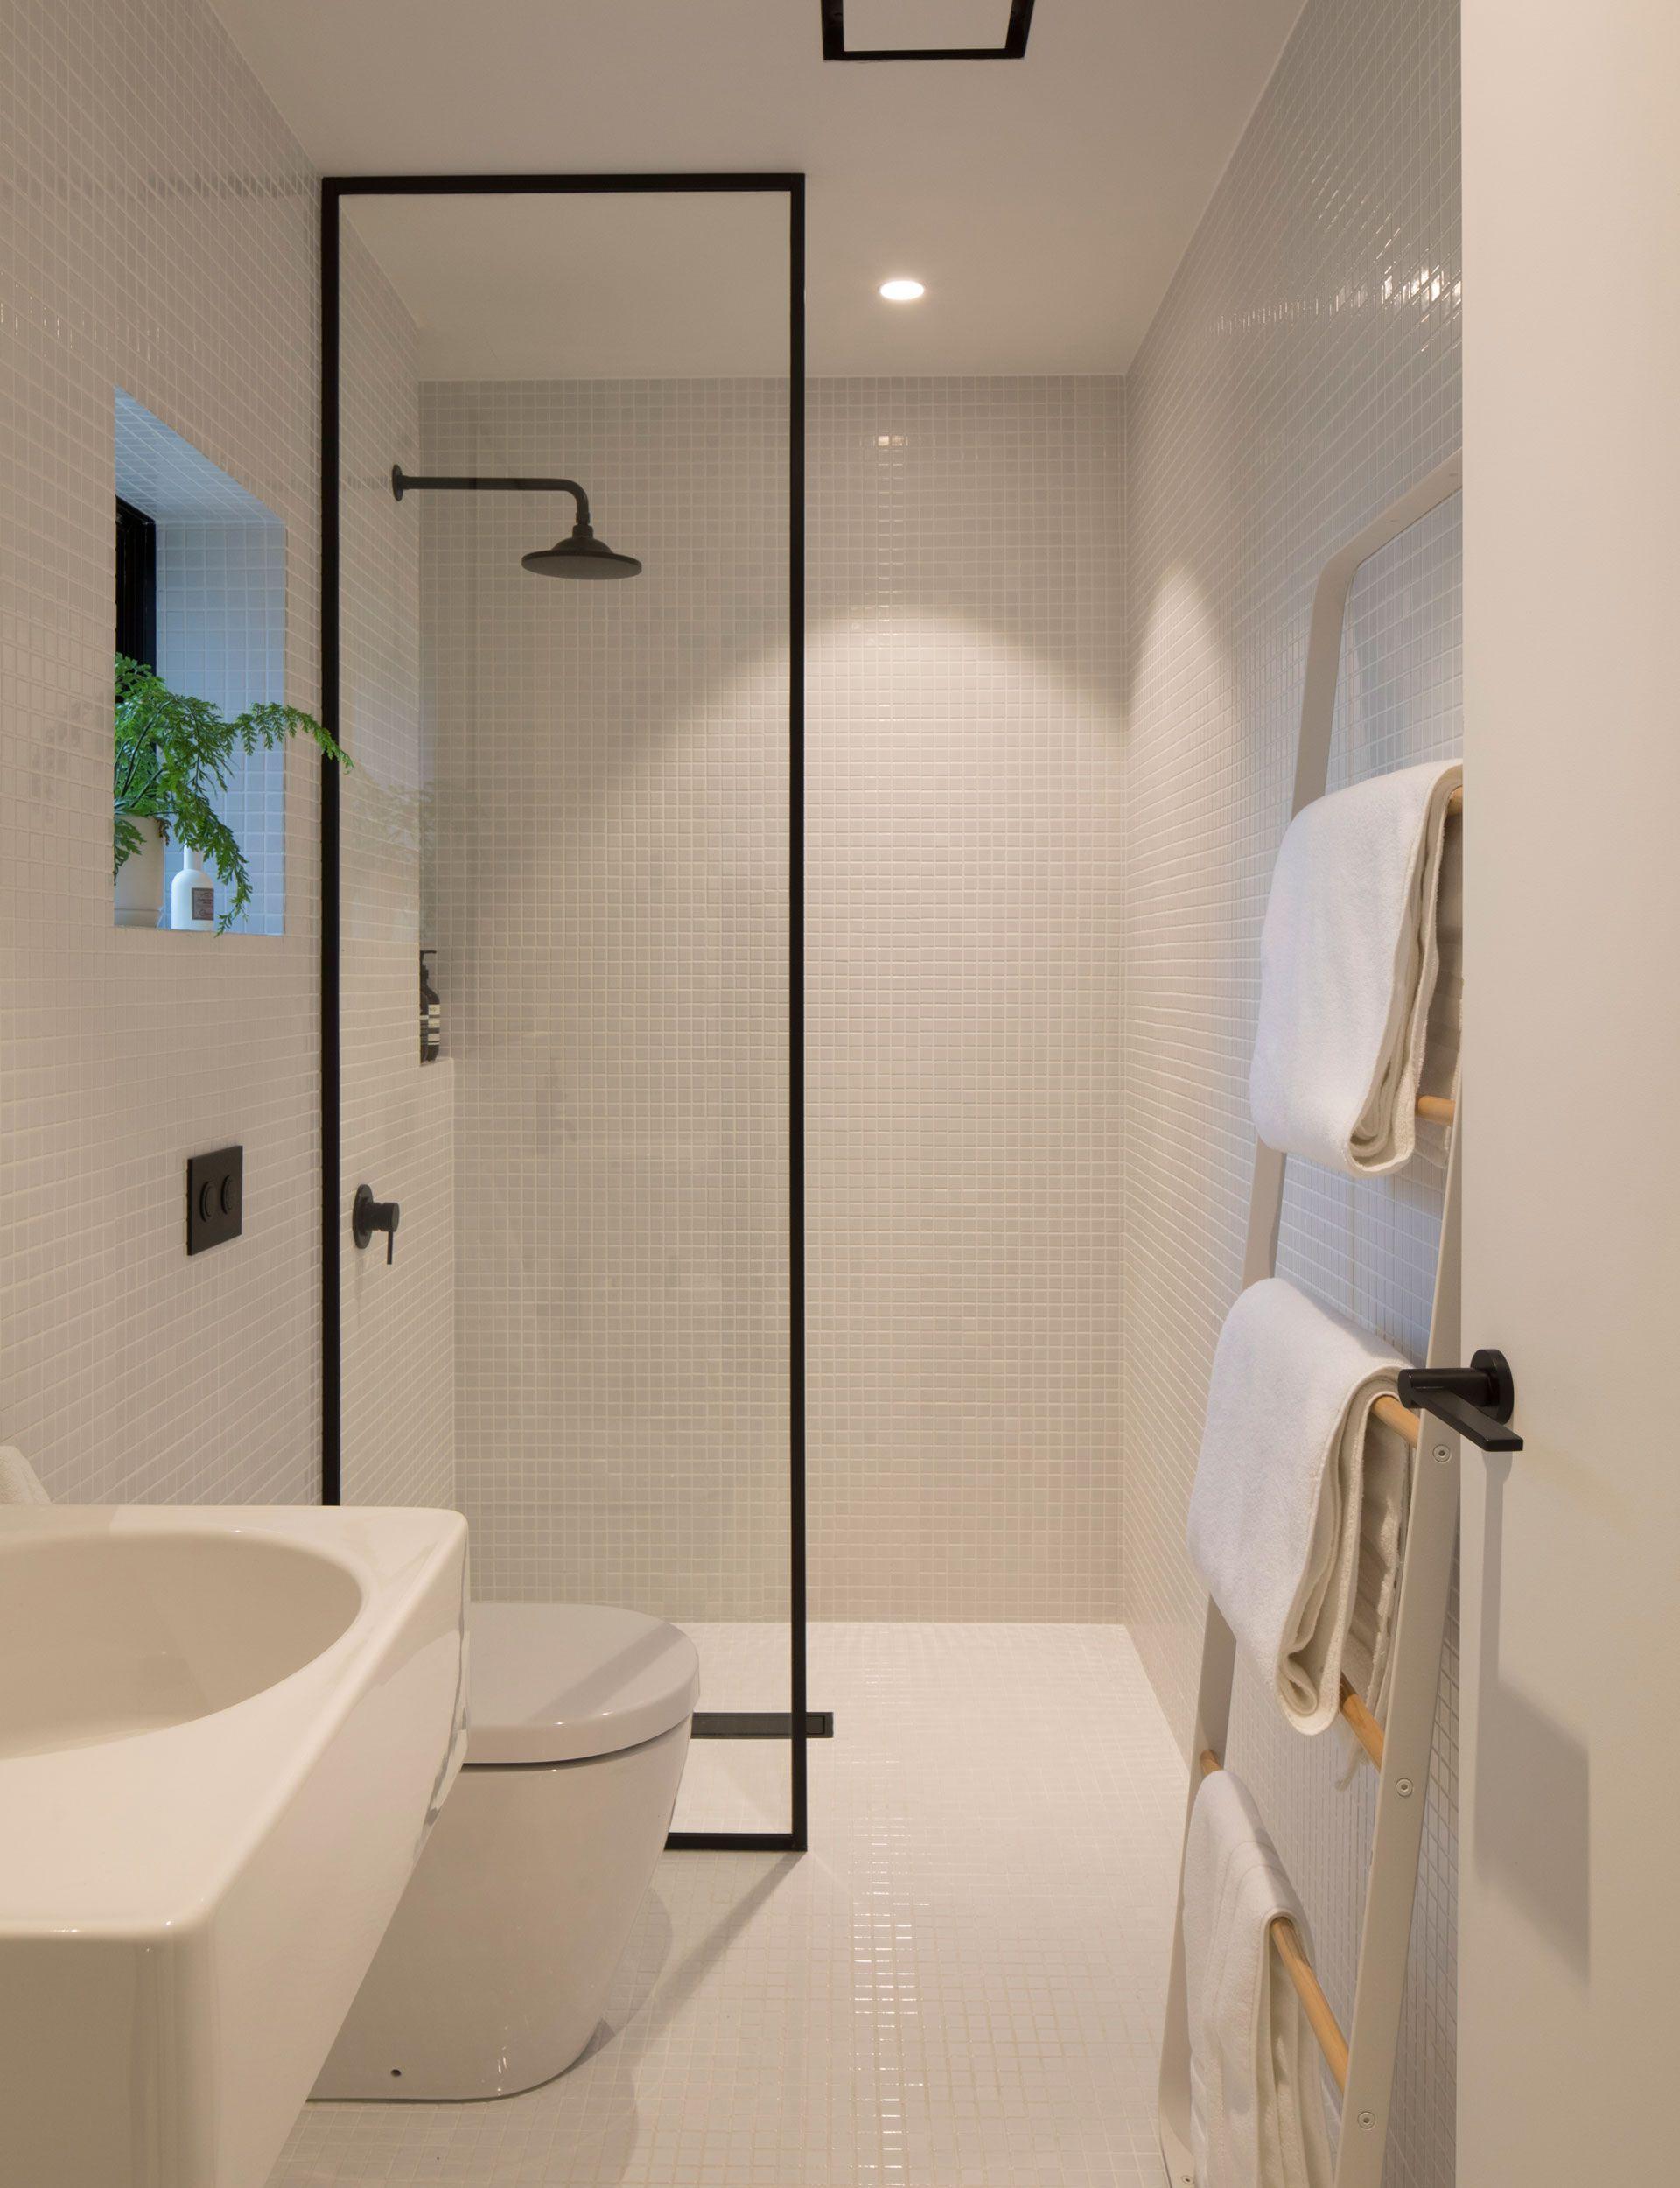 100 Great Minimalist Modern Bathroom Ideas Minimalist Bathroom Design Modern Bathroom Design Bathroom Interior Design